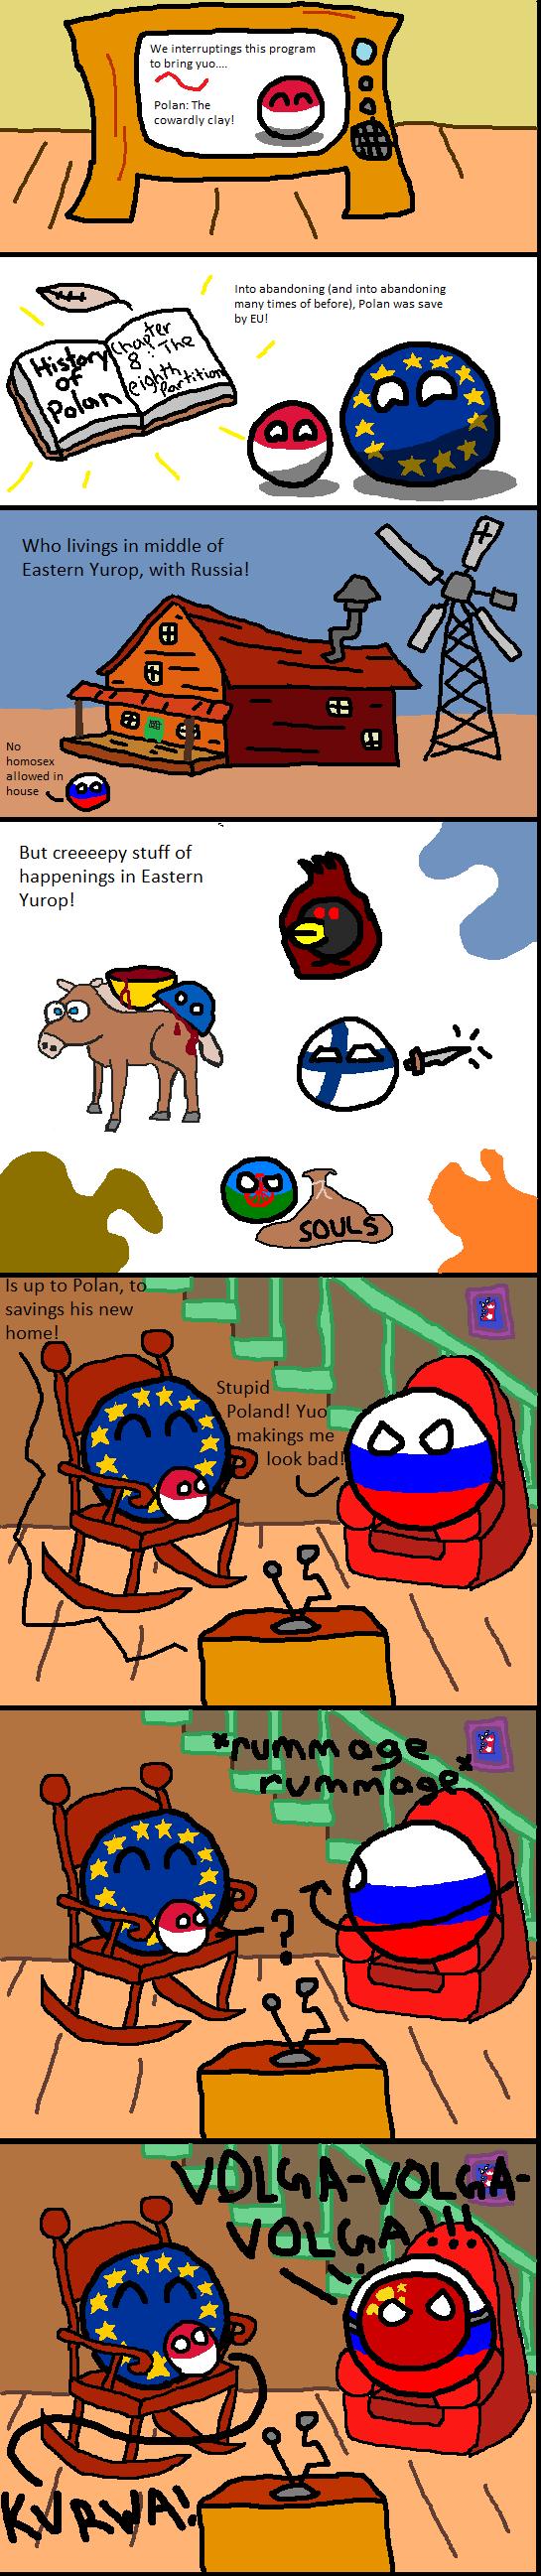 Poland the Cowardly Clay!